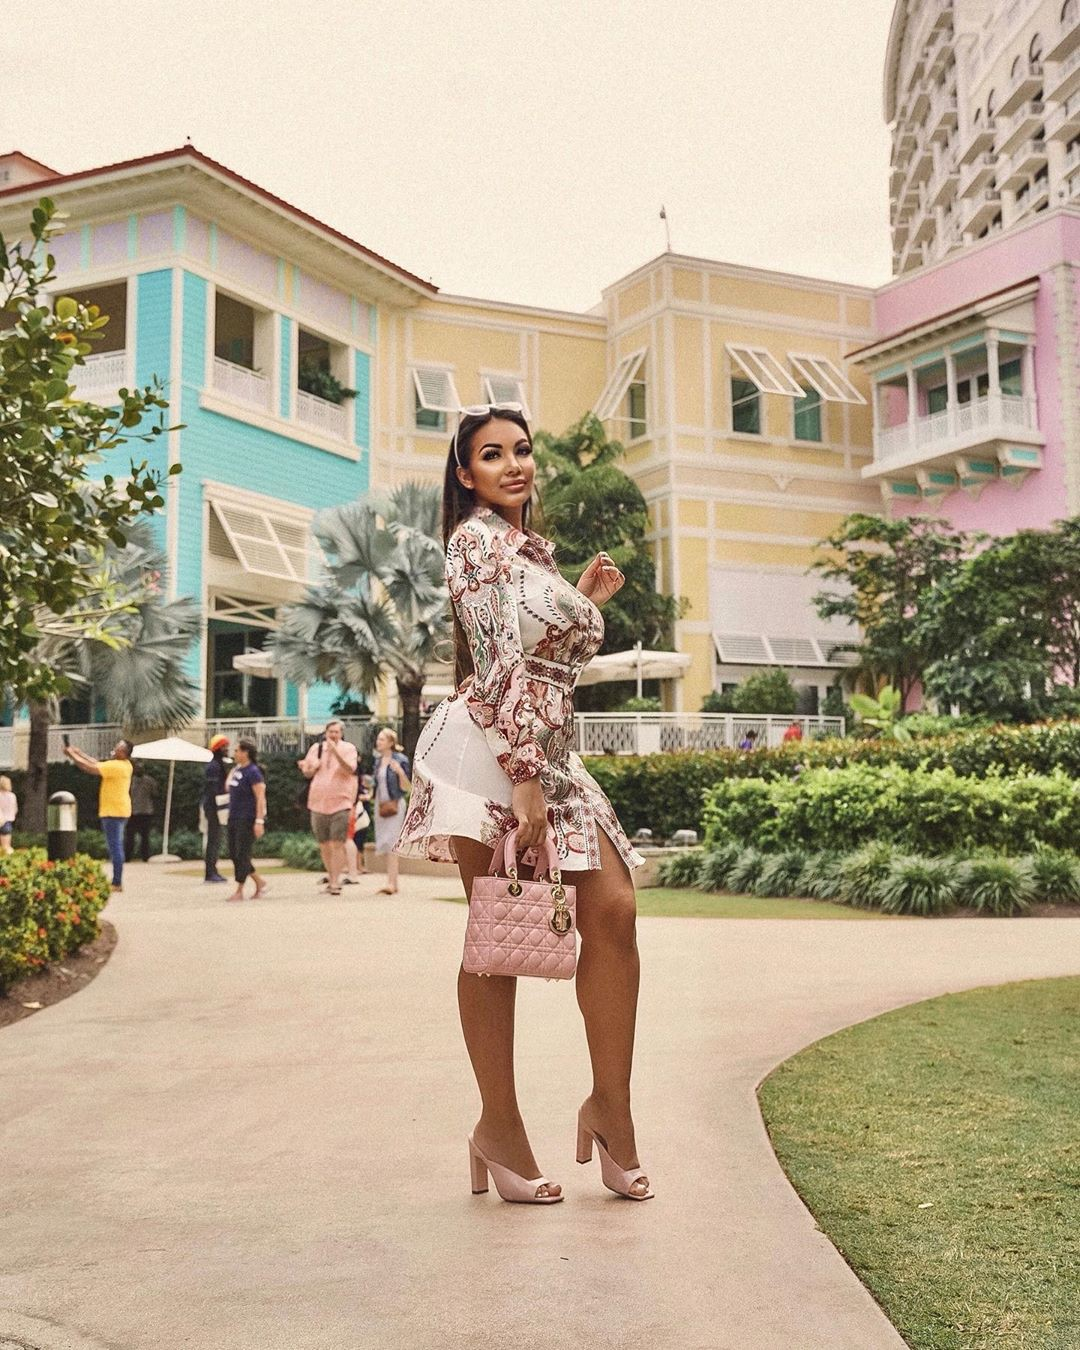 Aylen Alvarez girls instgram photography, outfit ideas, street fashion